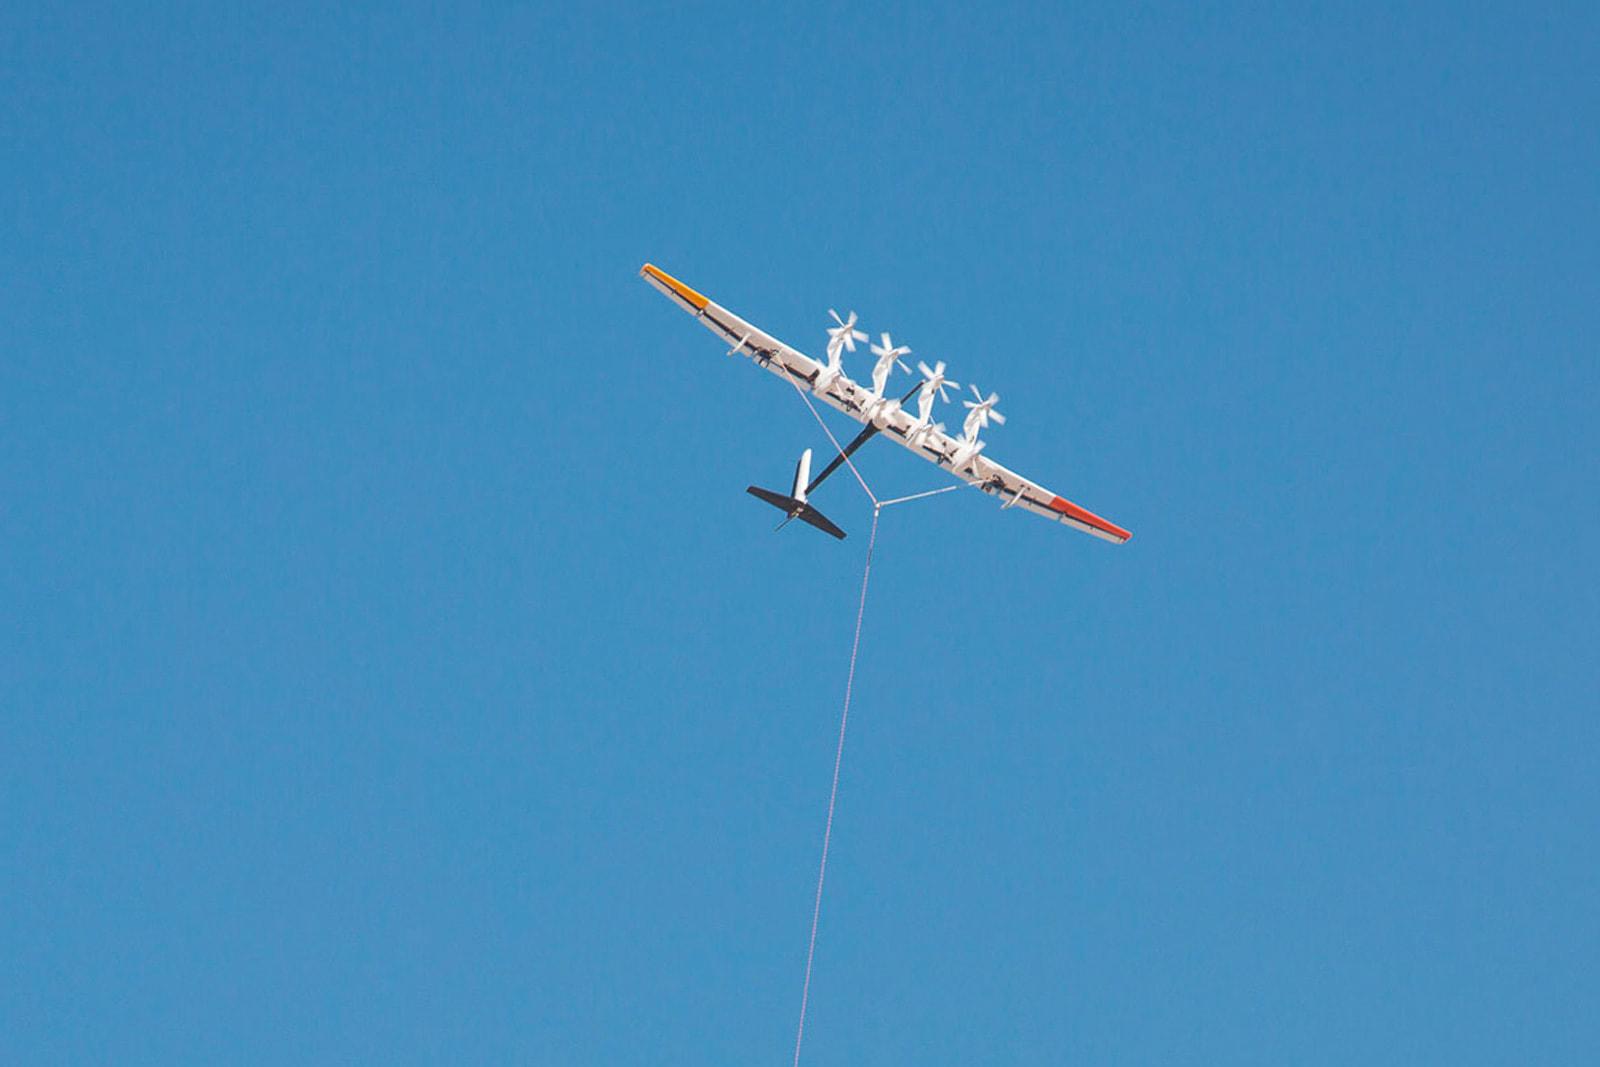 Shell backs Alphabet's power-generating kites in latest renewable bet